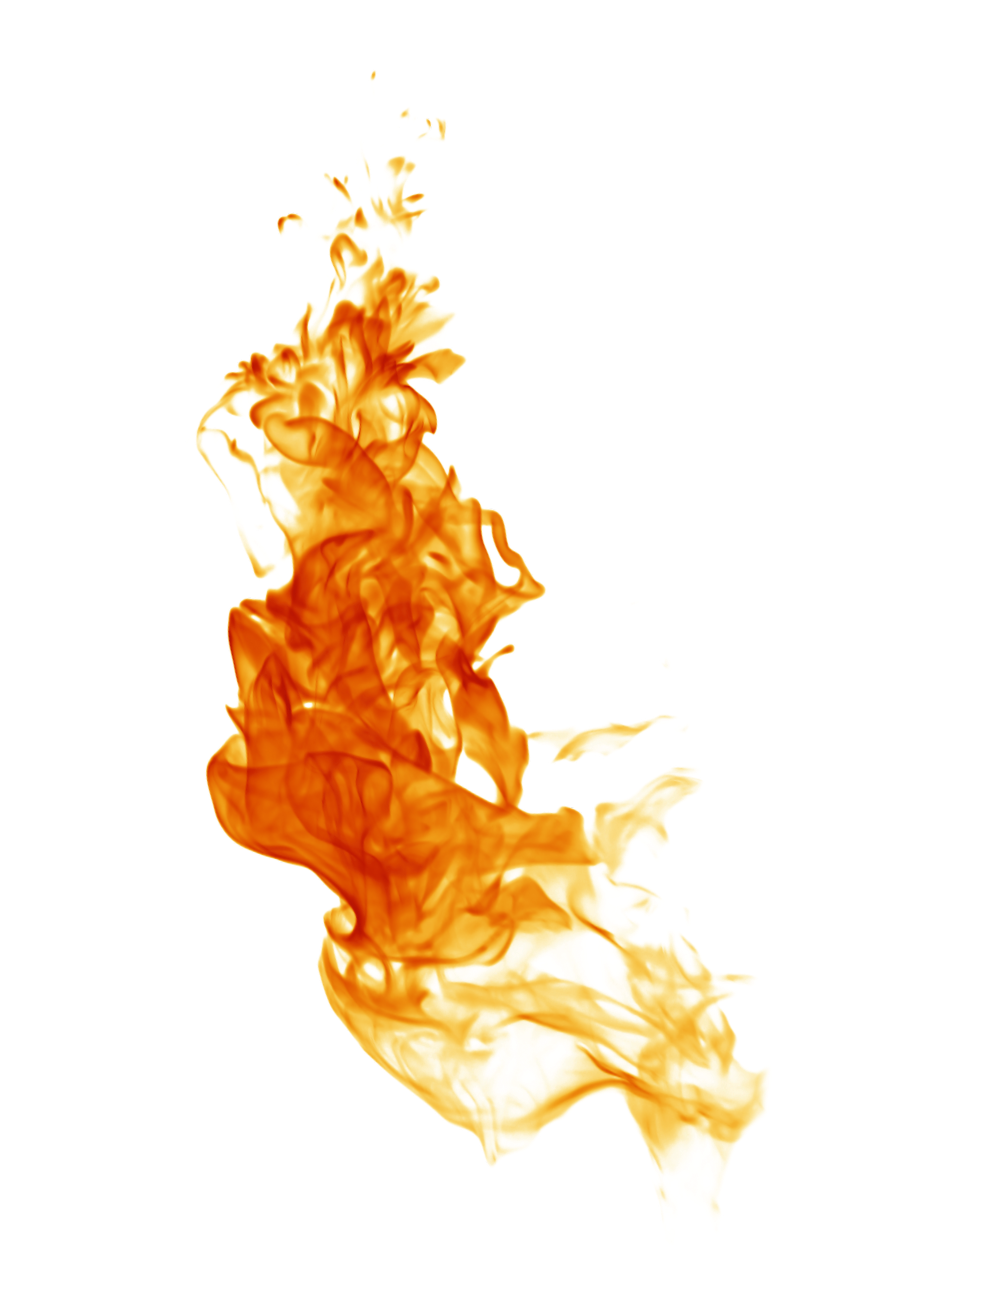 Flame 1